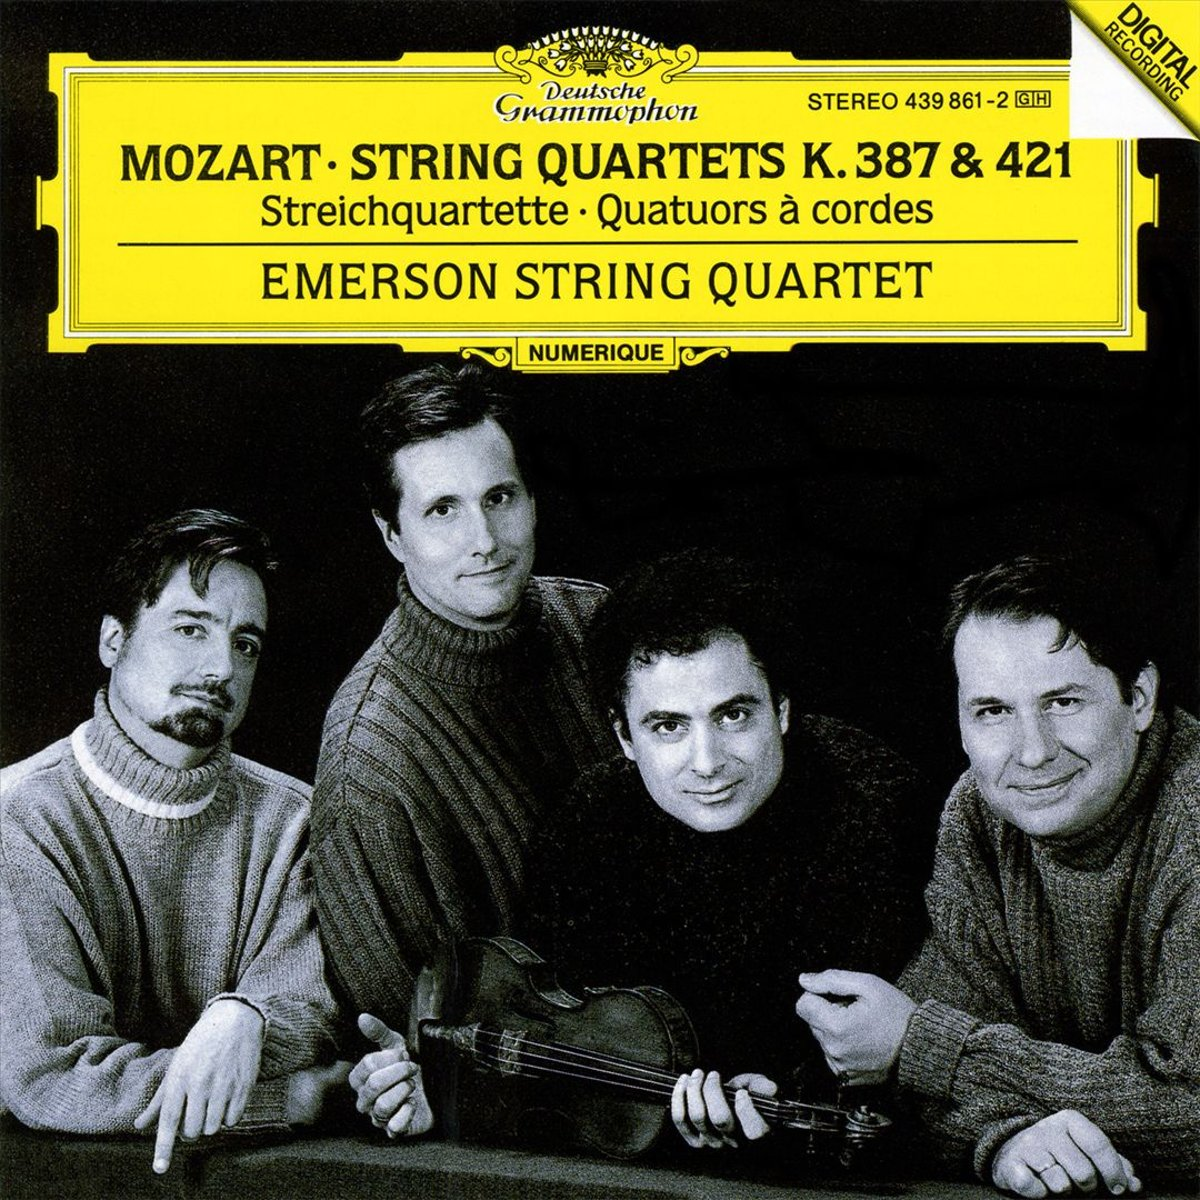 Emerson String Quartet. Mozart: String Quartets K.387 & 421 a reichel string quartet in c major op 8